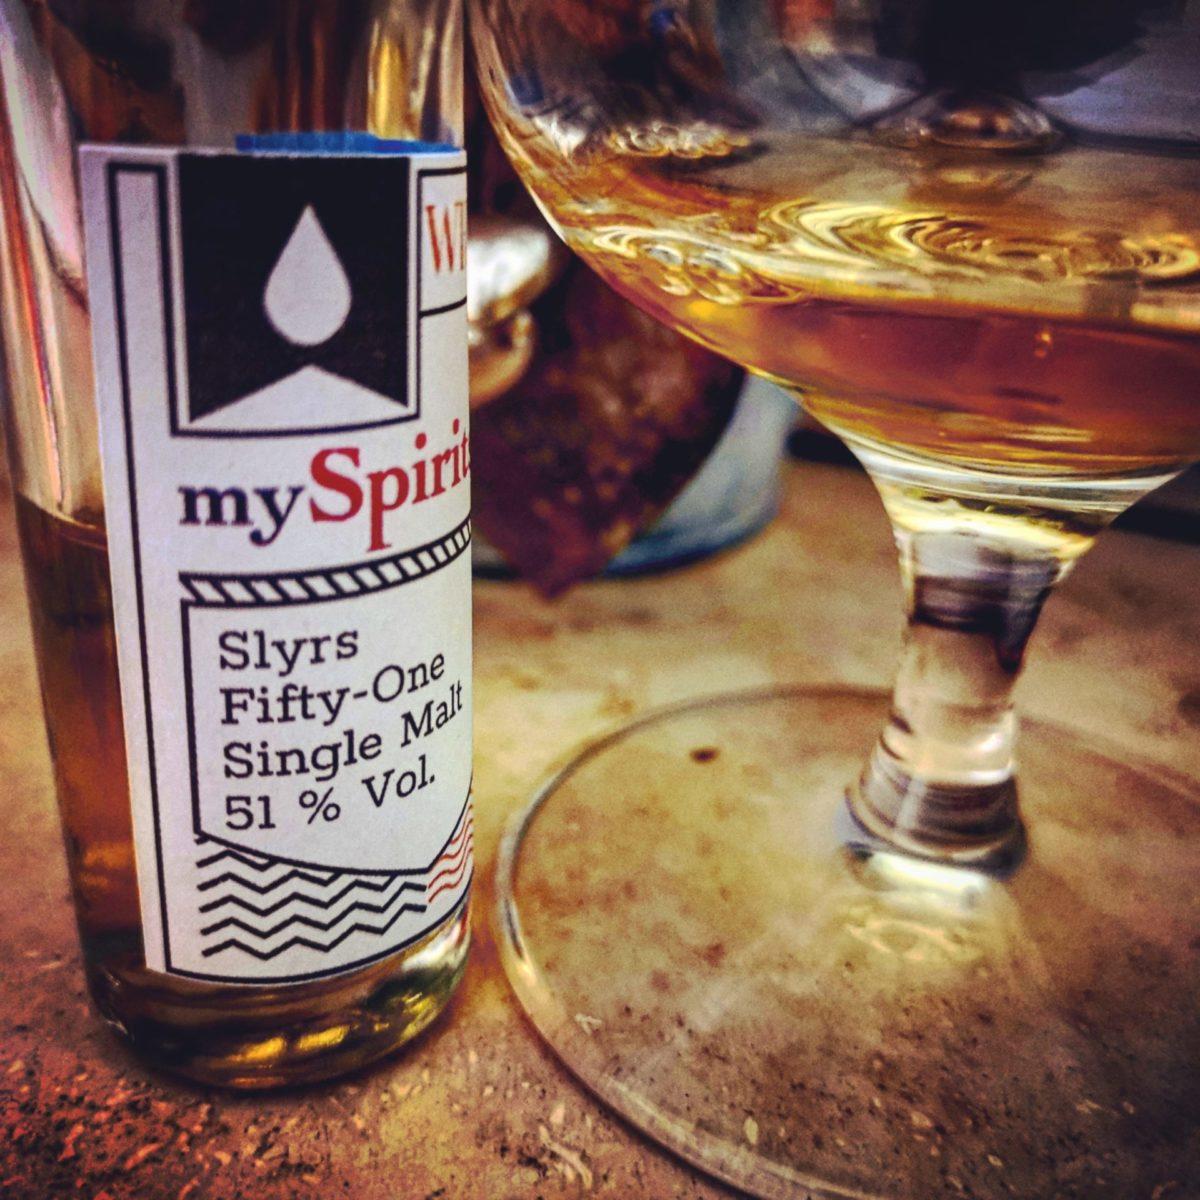 Slyrs Fifty-One German Single Malt Whisky